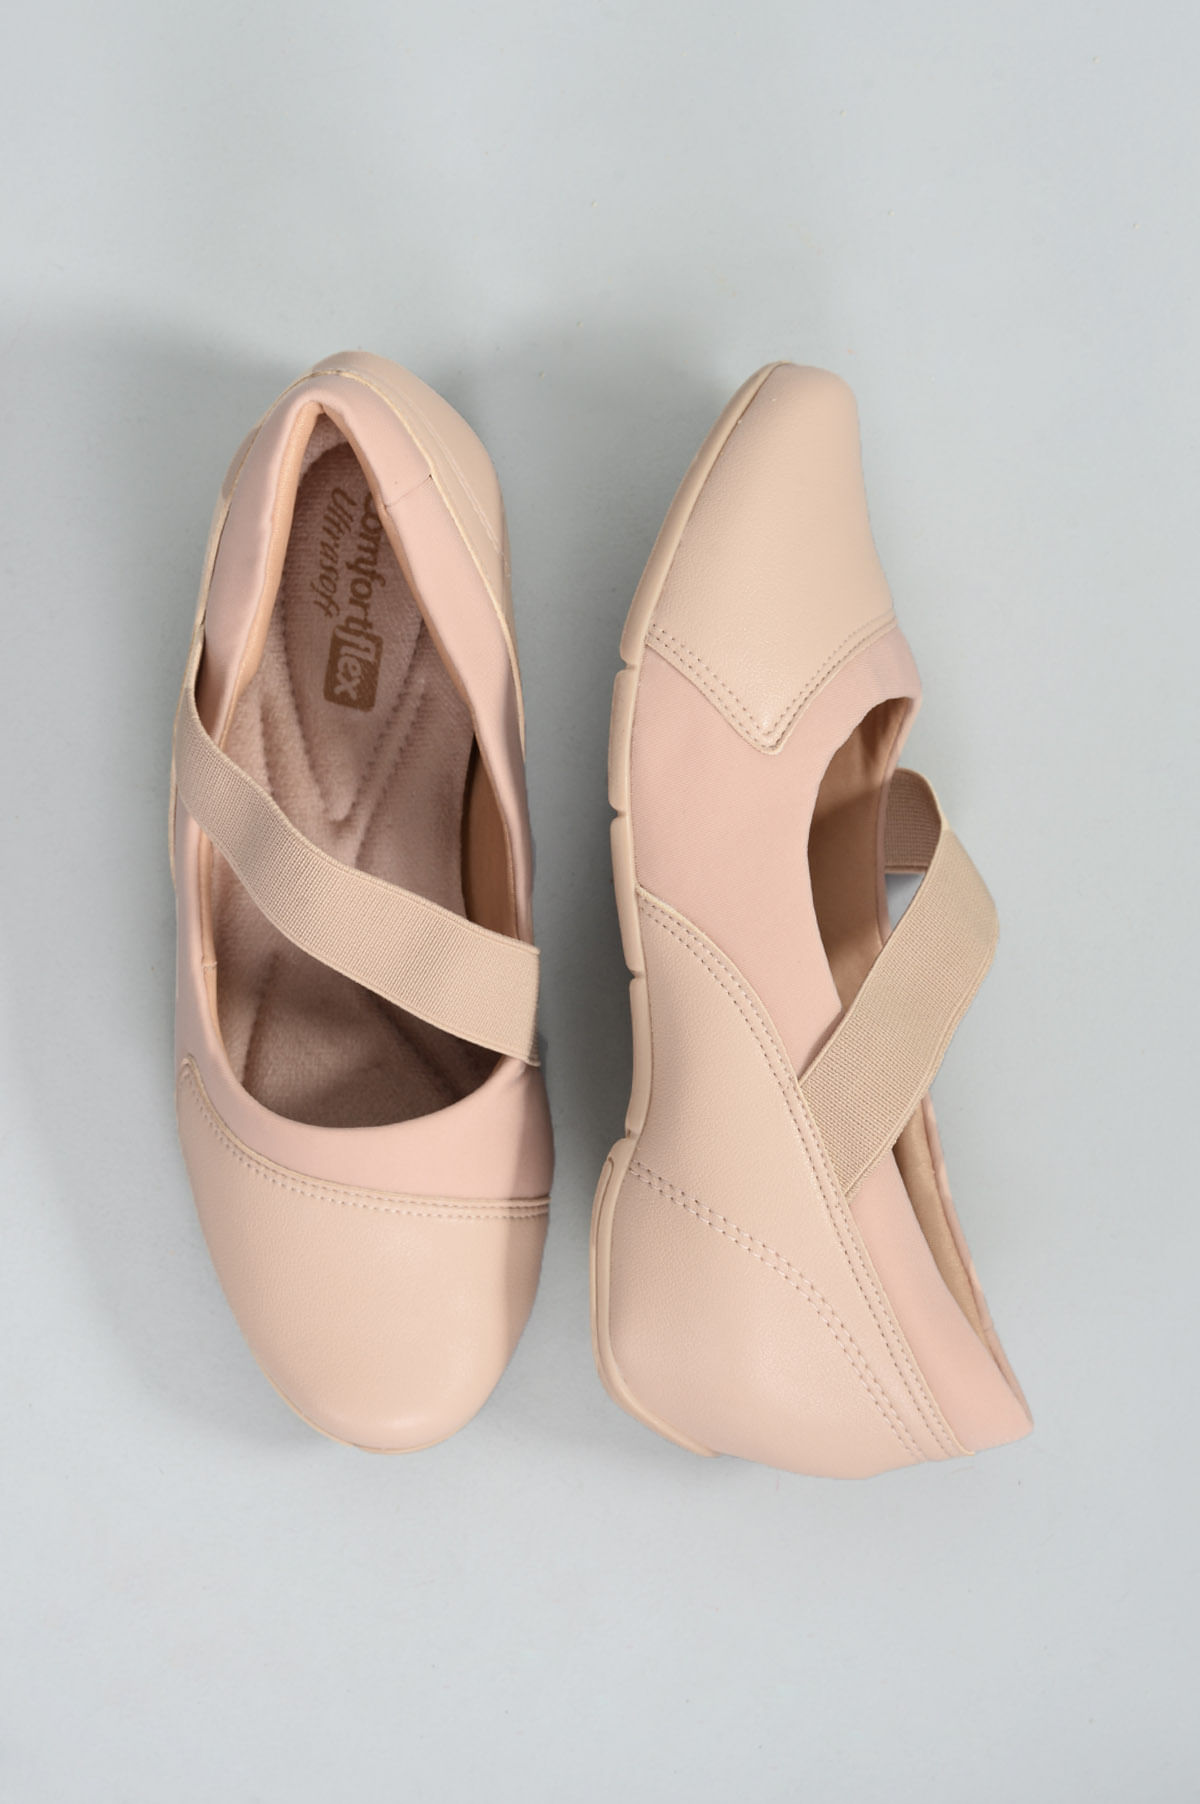 1dd37deb1 Sapato Feminino Ultrasoft Comfort Flex SINT - NUDE - Mundial Calçados